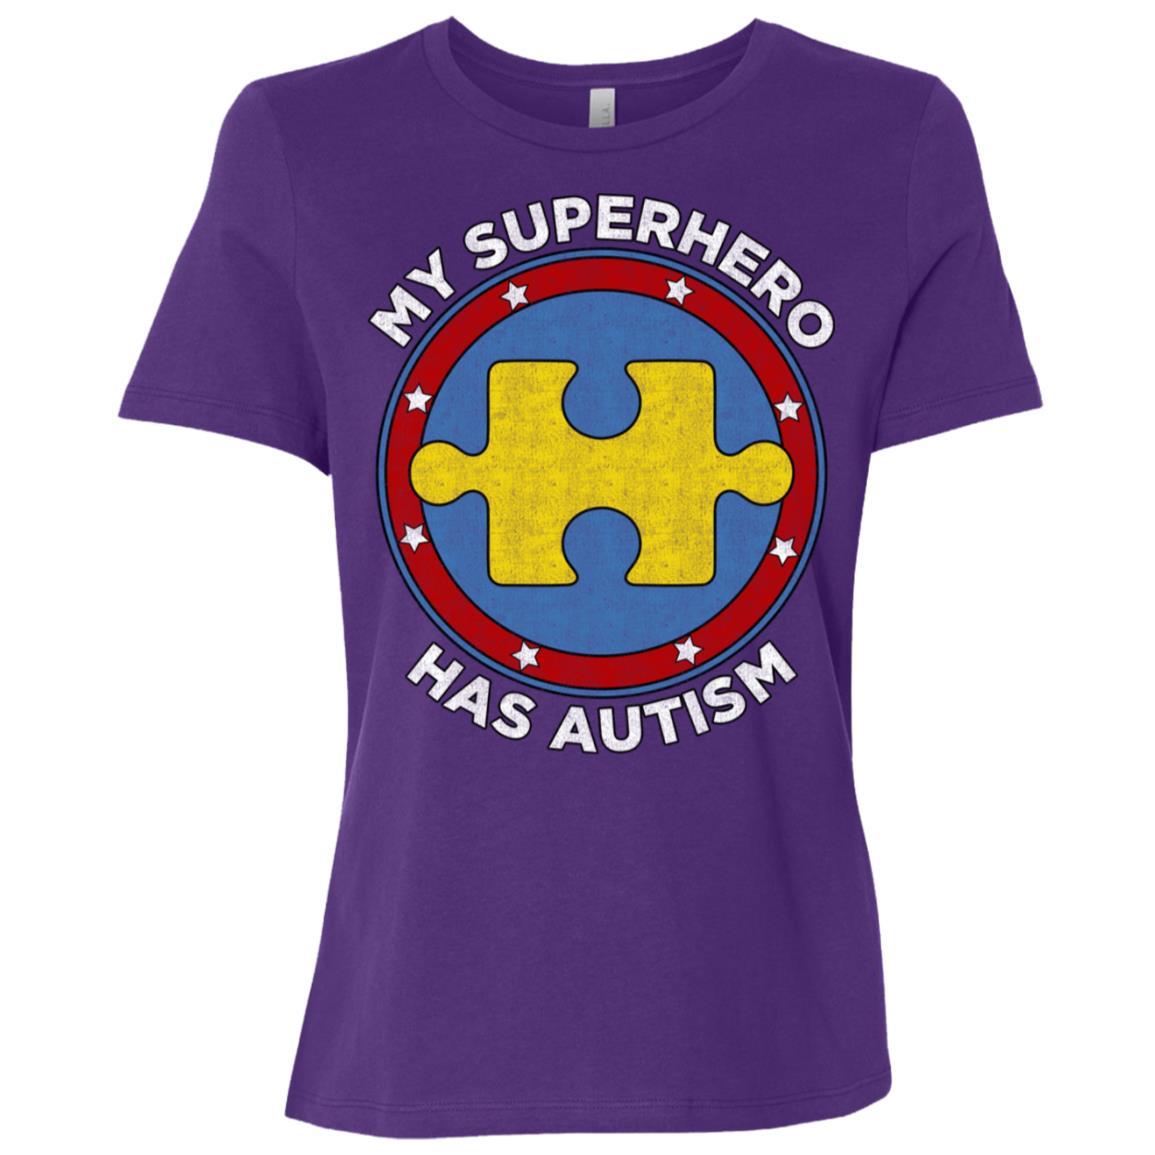 My Superhero Has Autism Awareness Support Women Short Sleeve T-Shirt